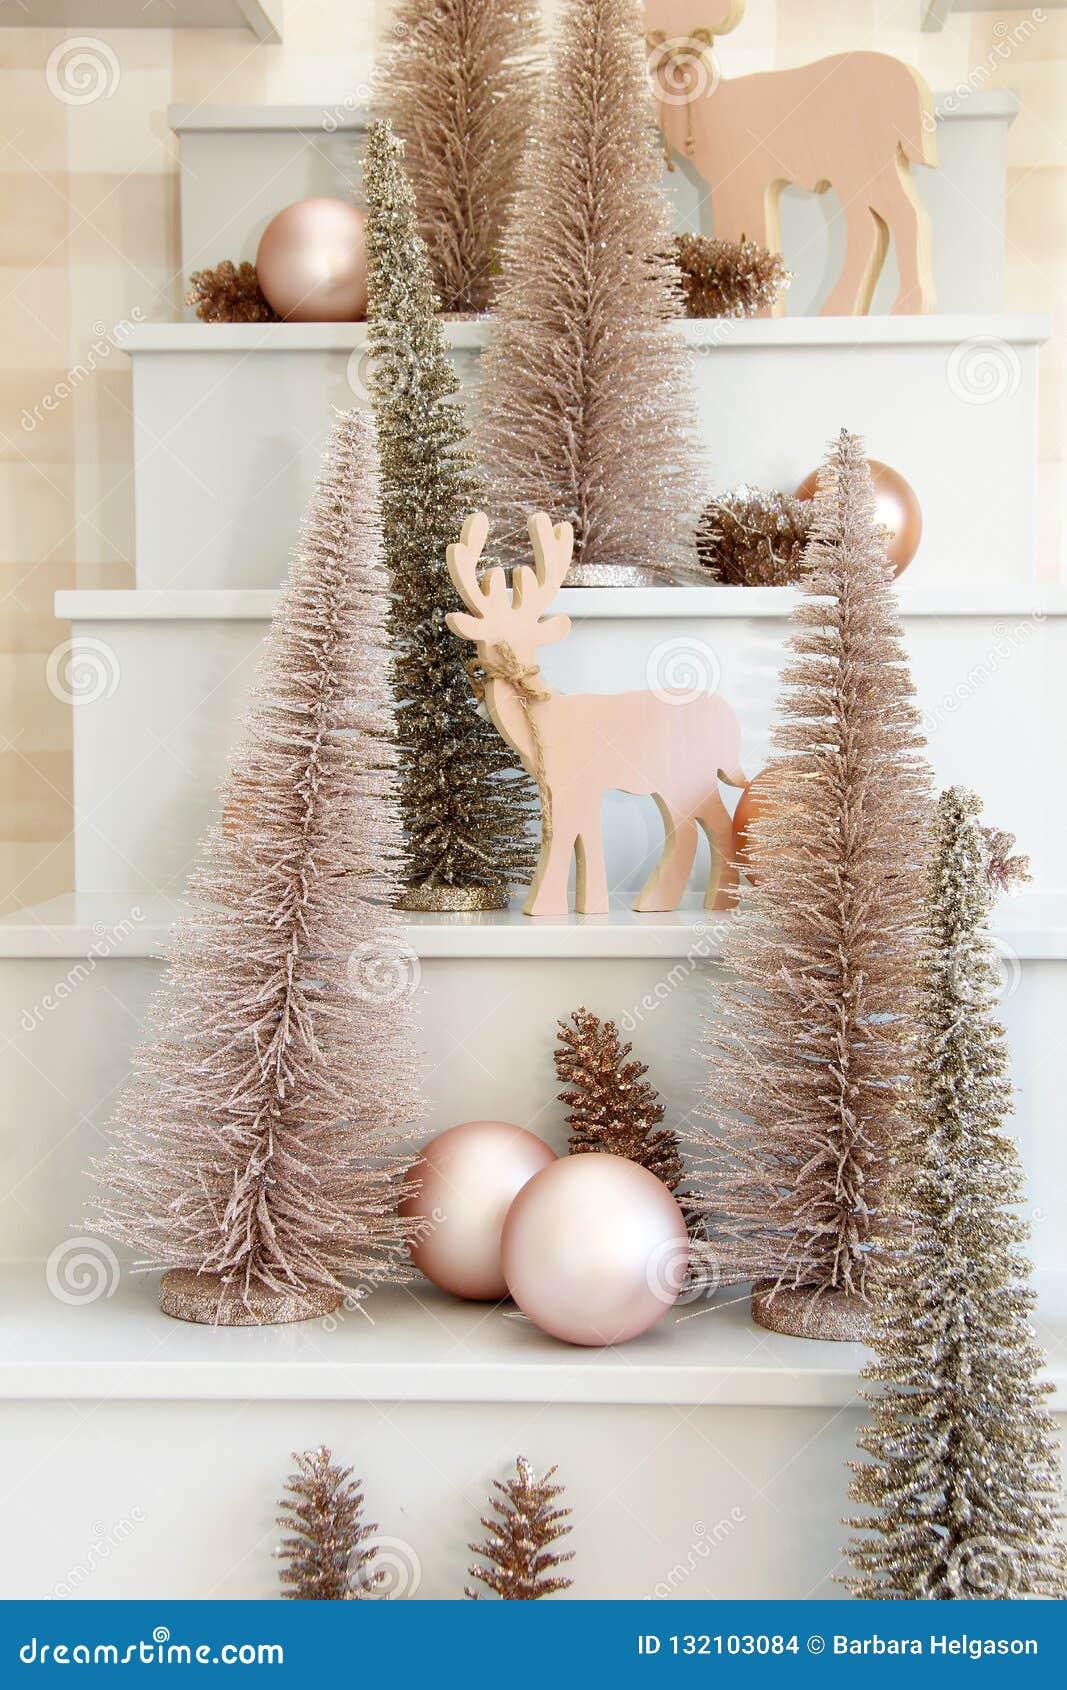 Wooden Reindeer And Christmas Tree Ornament Display Stock Photo Image Of Displayed Display 132103084